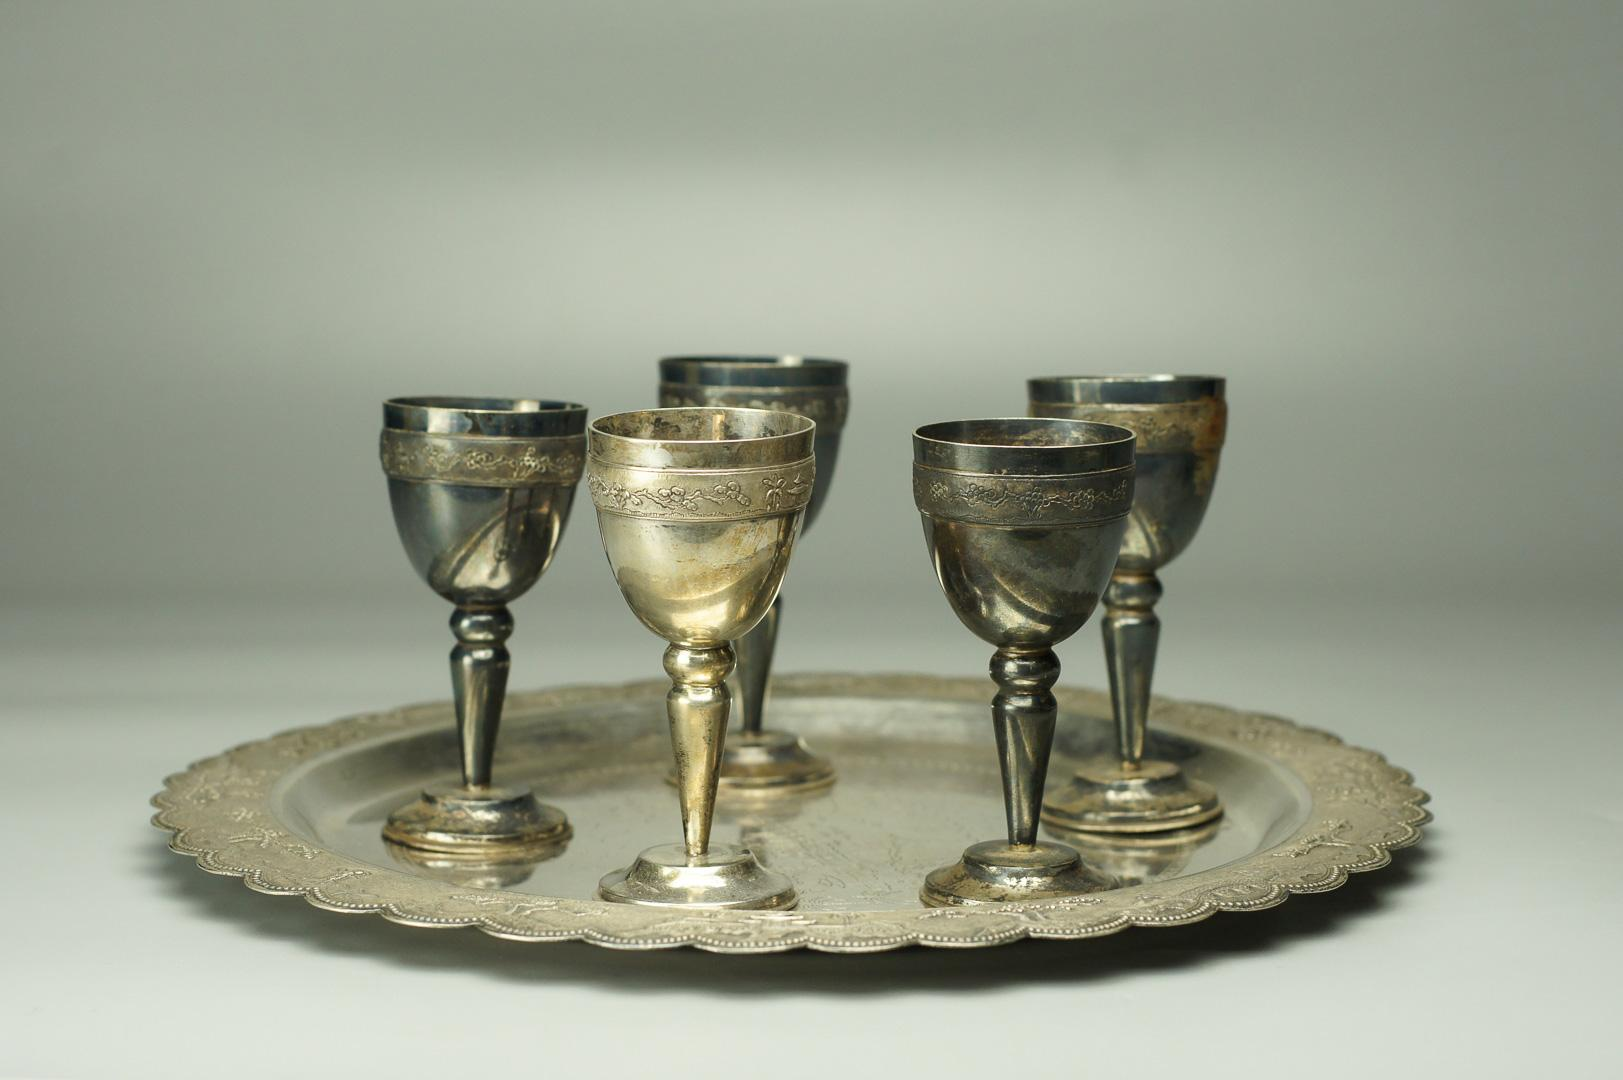 Ликерный набор графин и 6 рюмок на подносе серебро